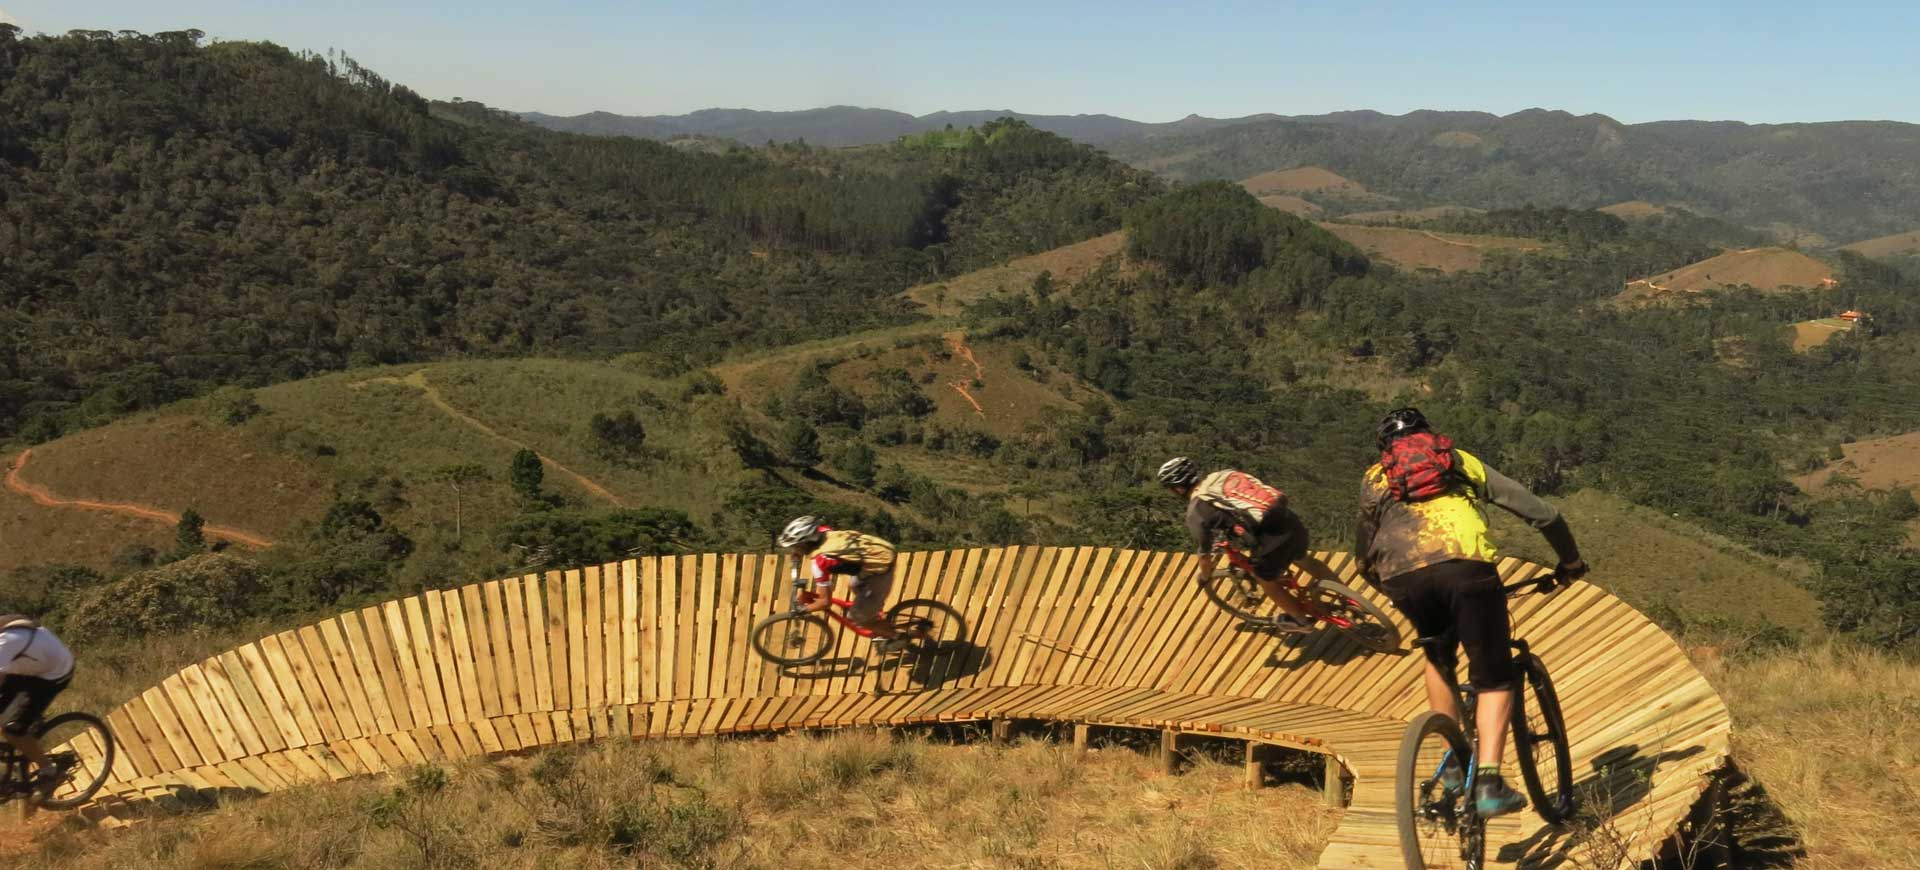 Trilhas para Mountain Bike: Zoom Bike Park